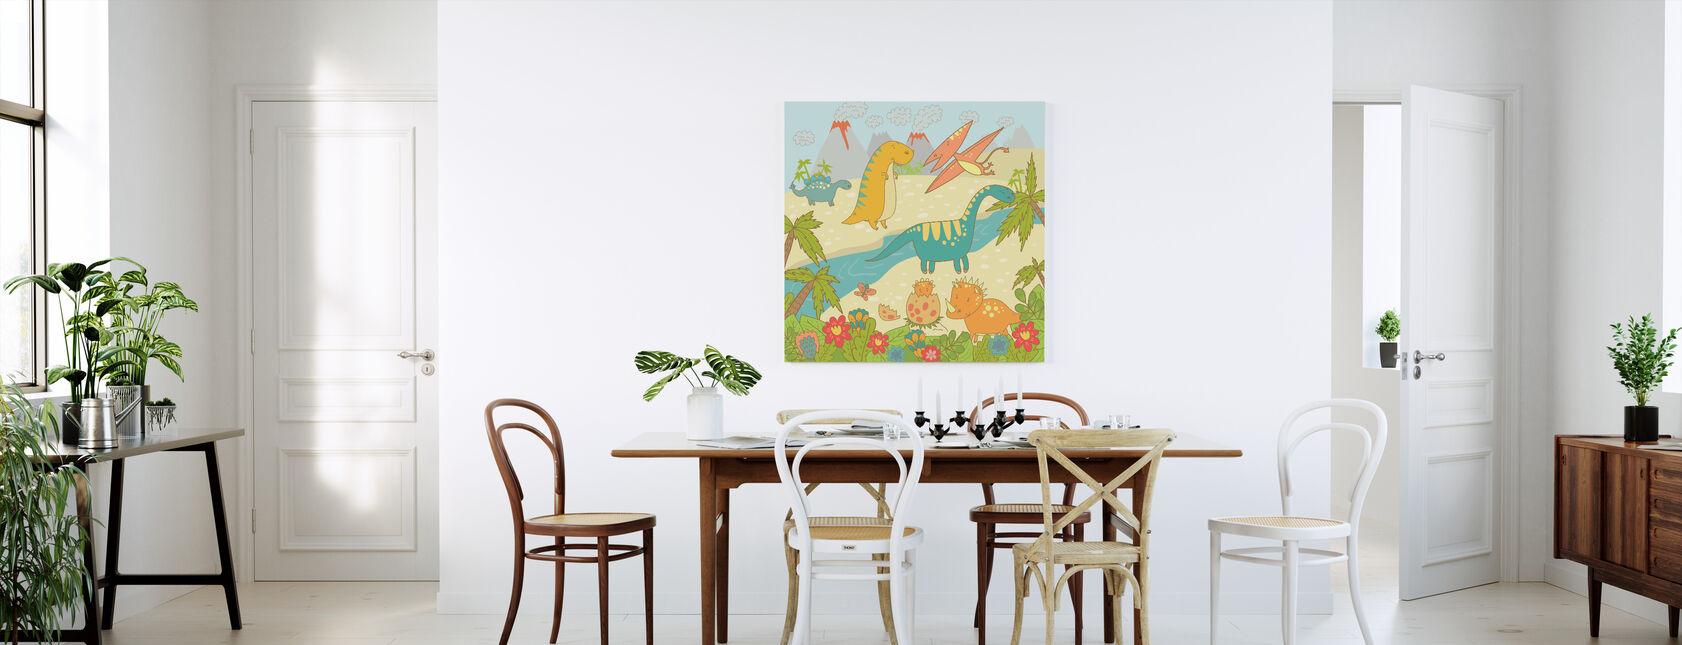 Dinosaurier World - Canvastavla - Kök